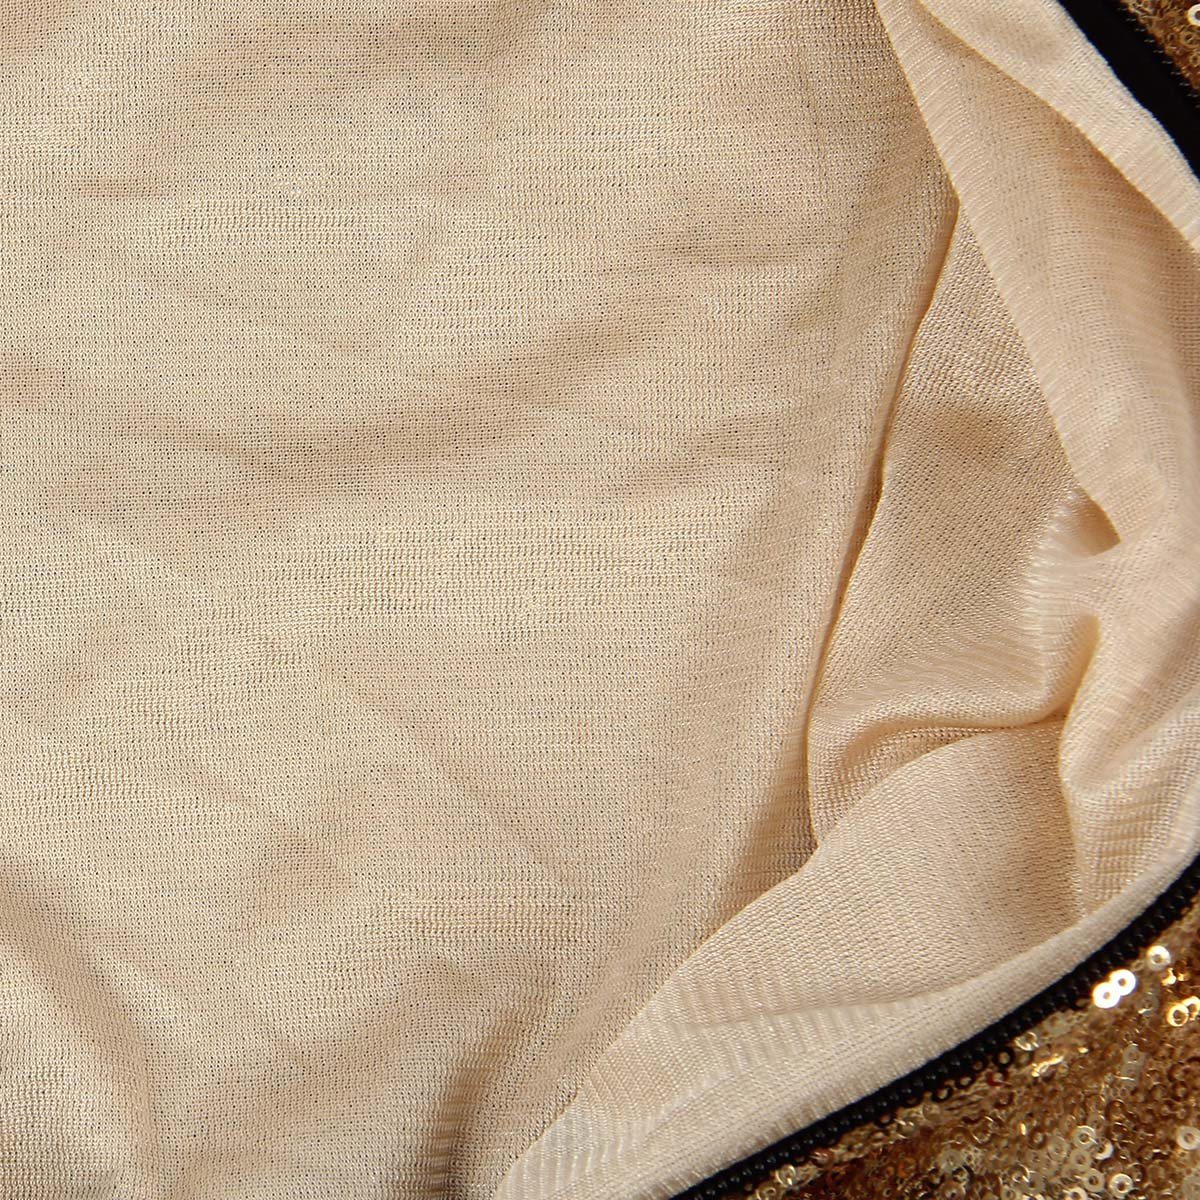 Borlai 1-6 Kids Toddler Girl Long Sleeve Sequin Zipper Coat Outwear Fashion Jacket